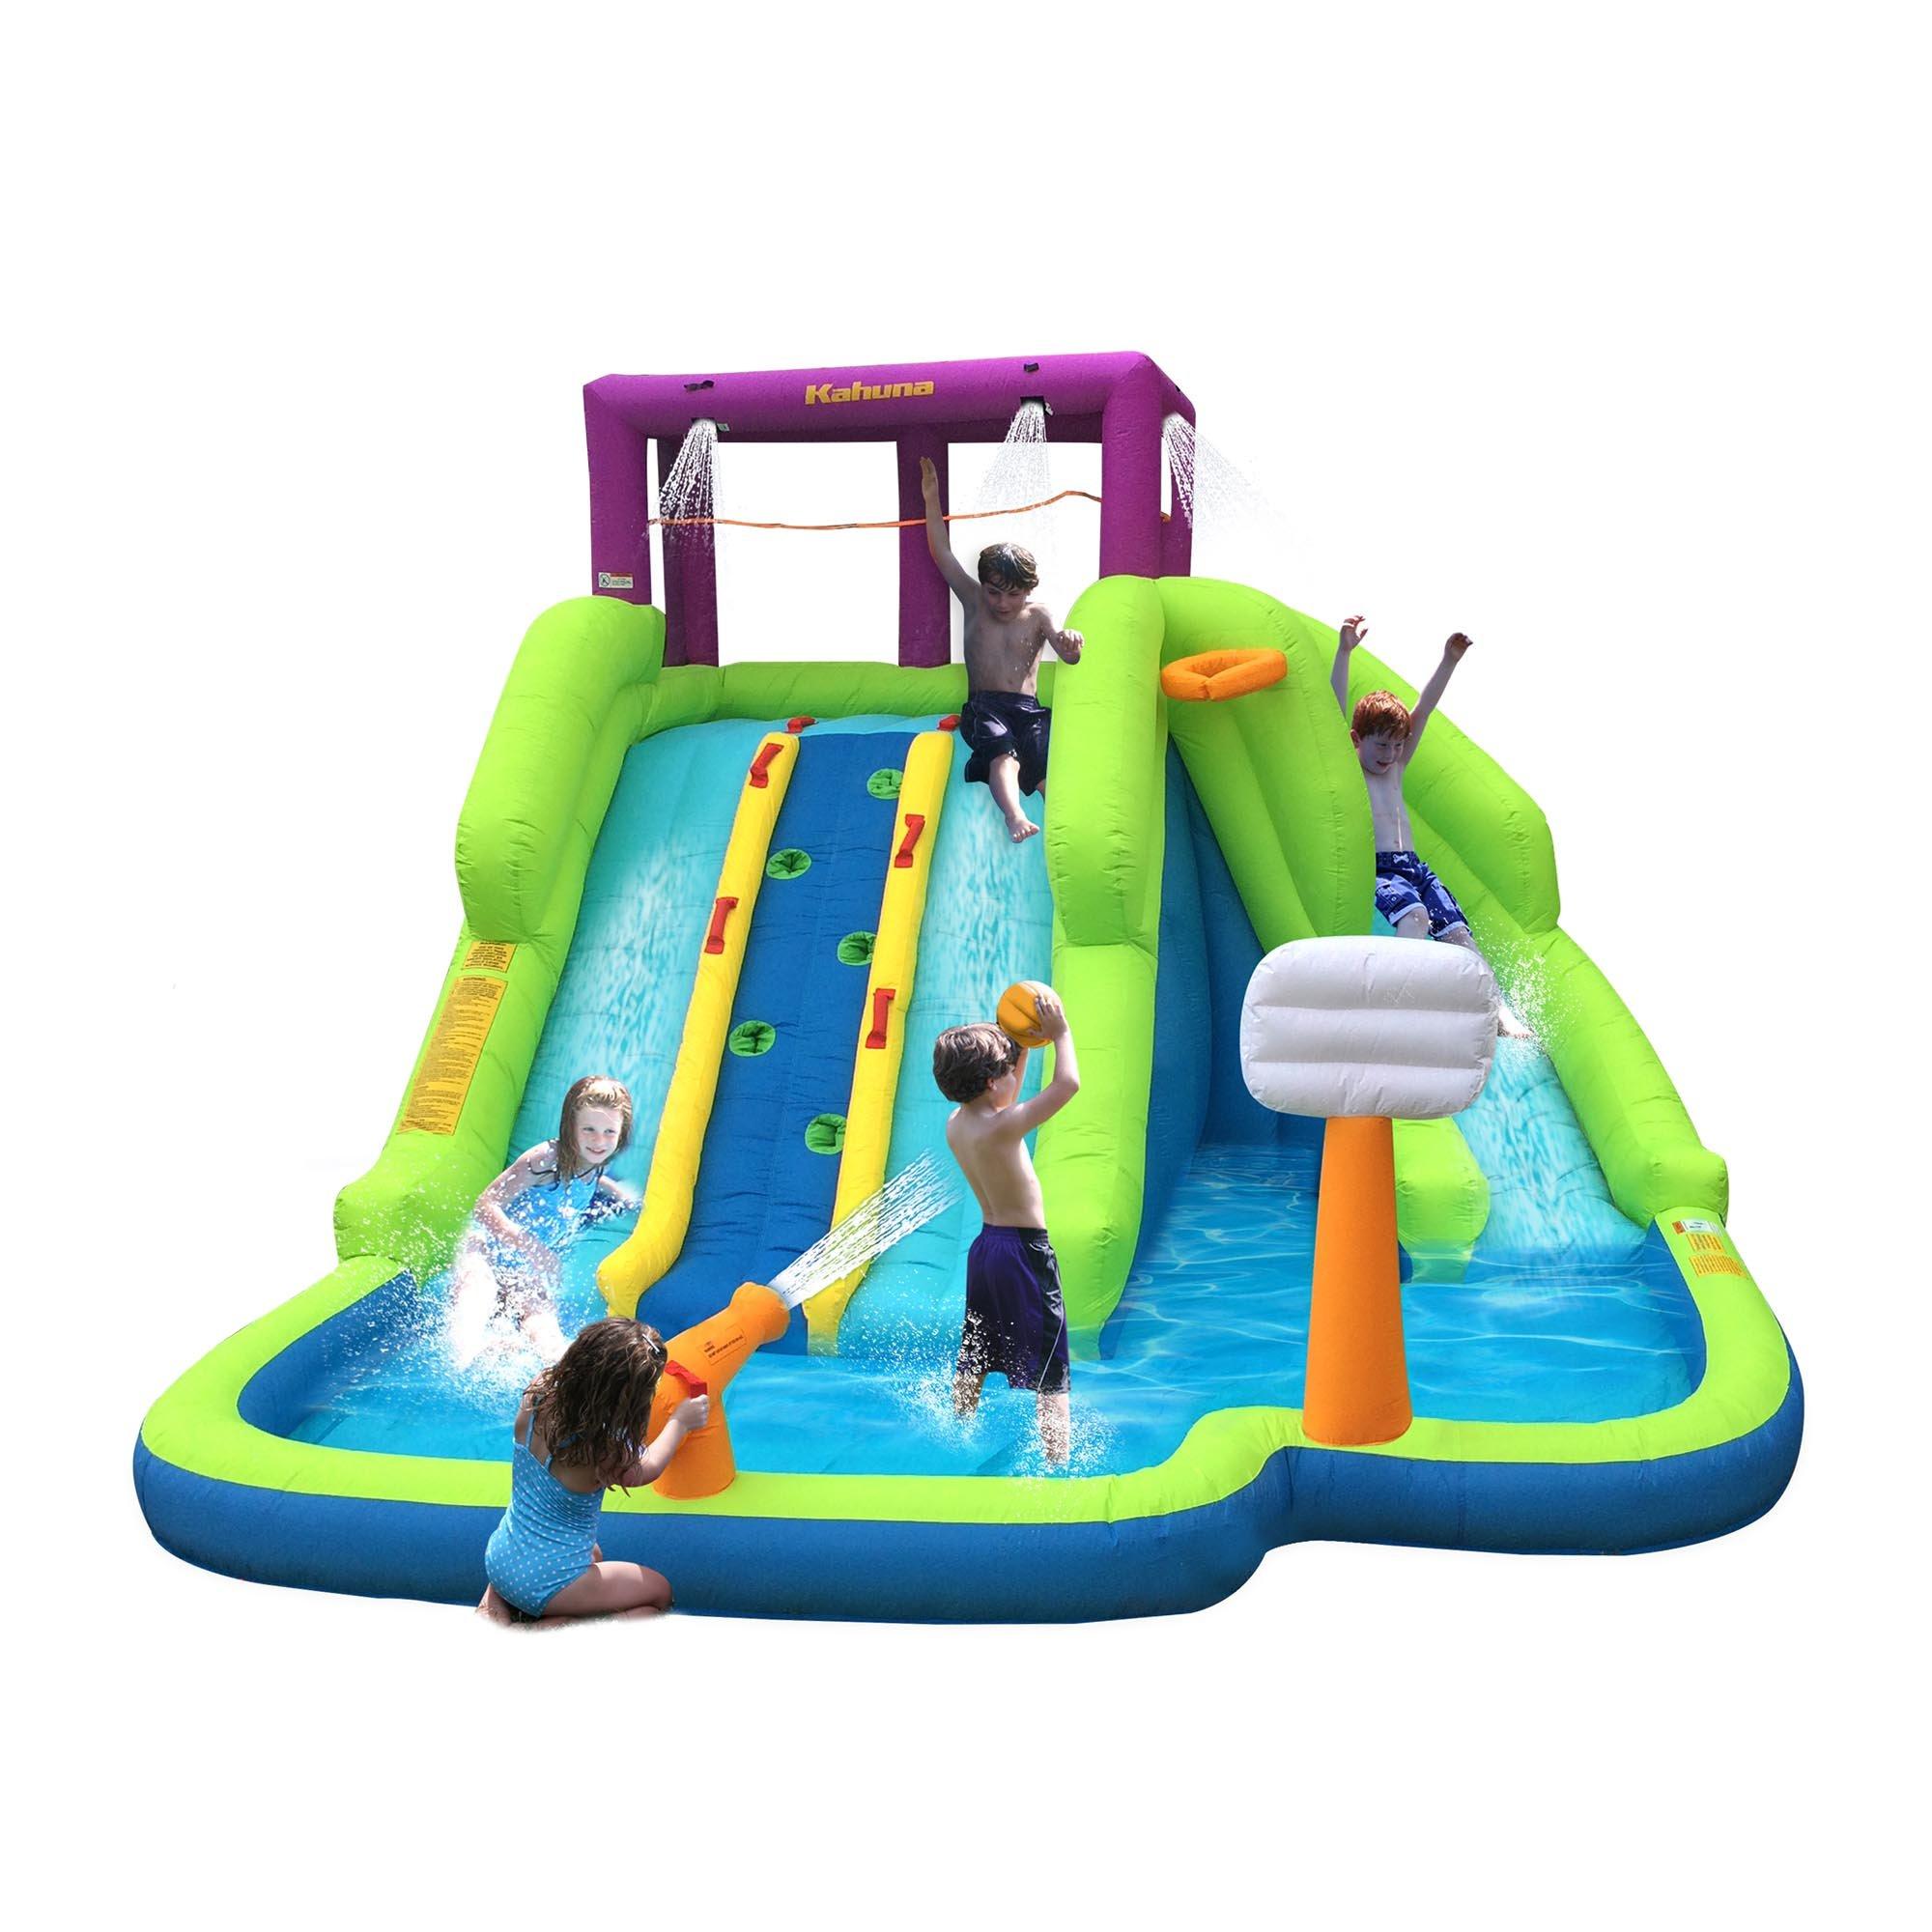 Magic Time Triple Blast Kids Outdoor Inflatable Splash Pool Backyard Water Slide